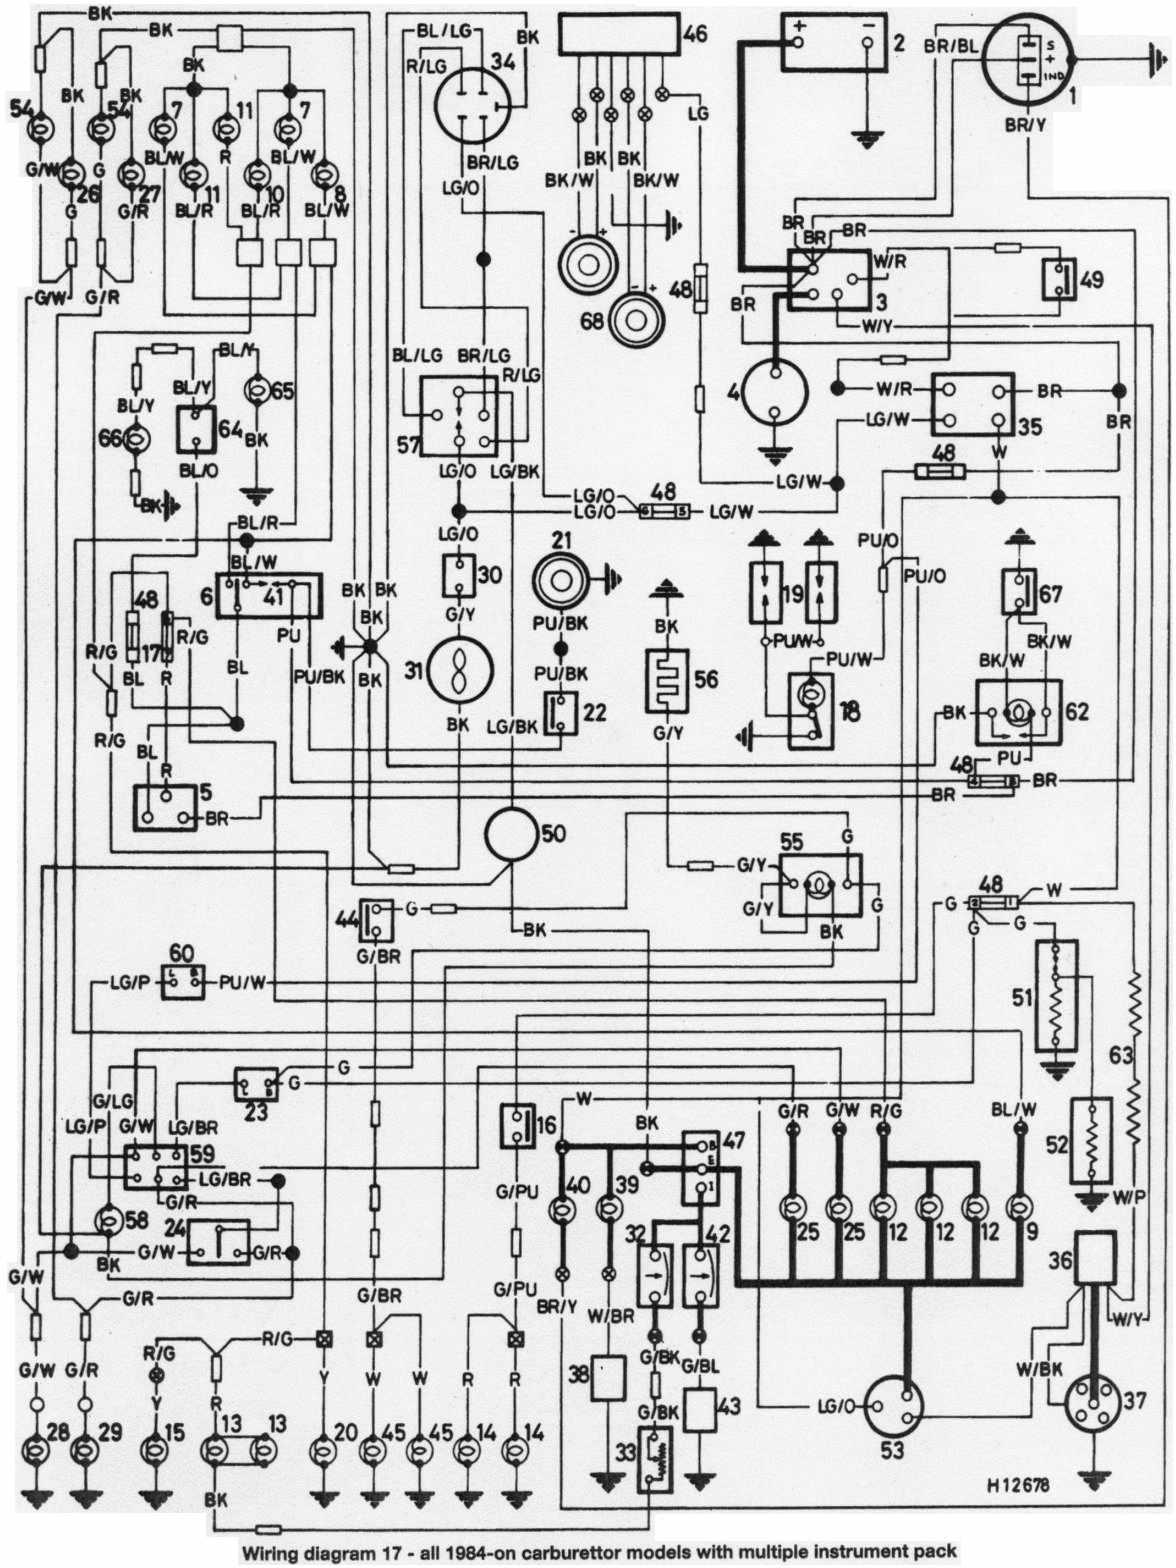 2004 winnebago wiring diagram electrical wiring diagrams rh cytrus co 1990 Winnebago Chieftain Interior 1989 Winnebago Adventurer